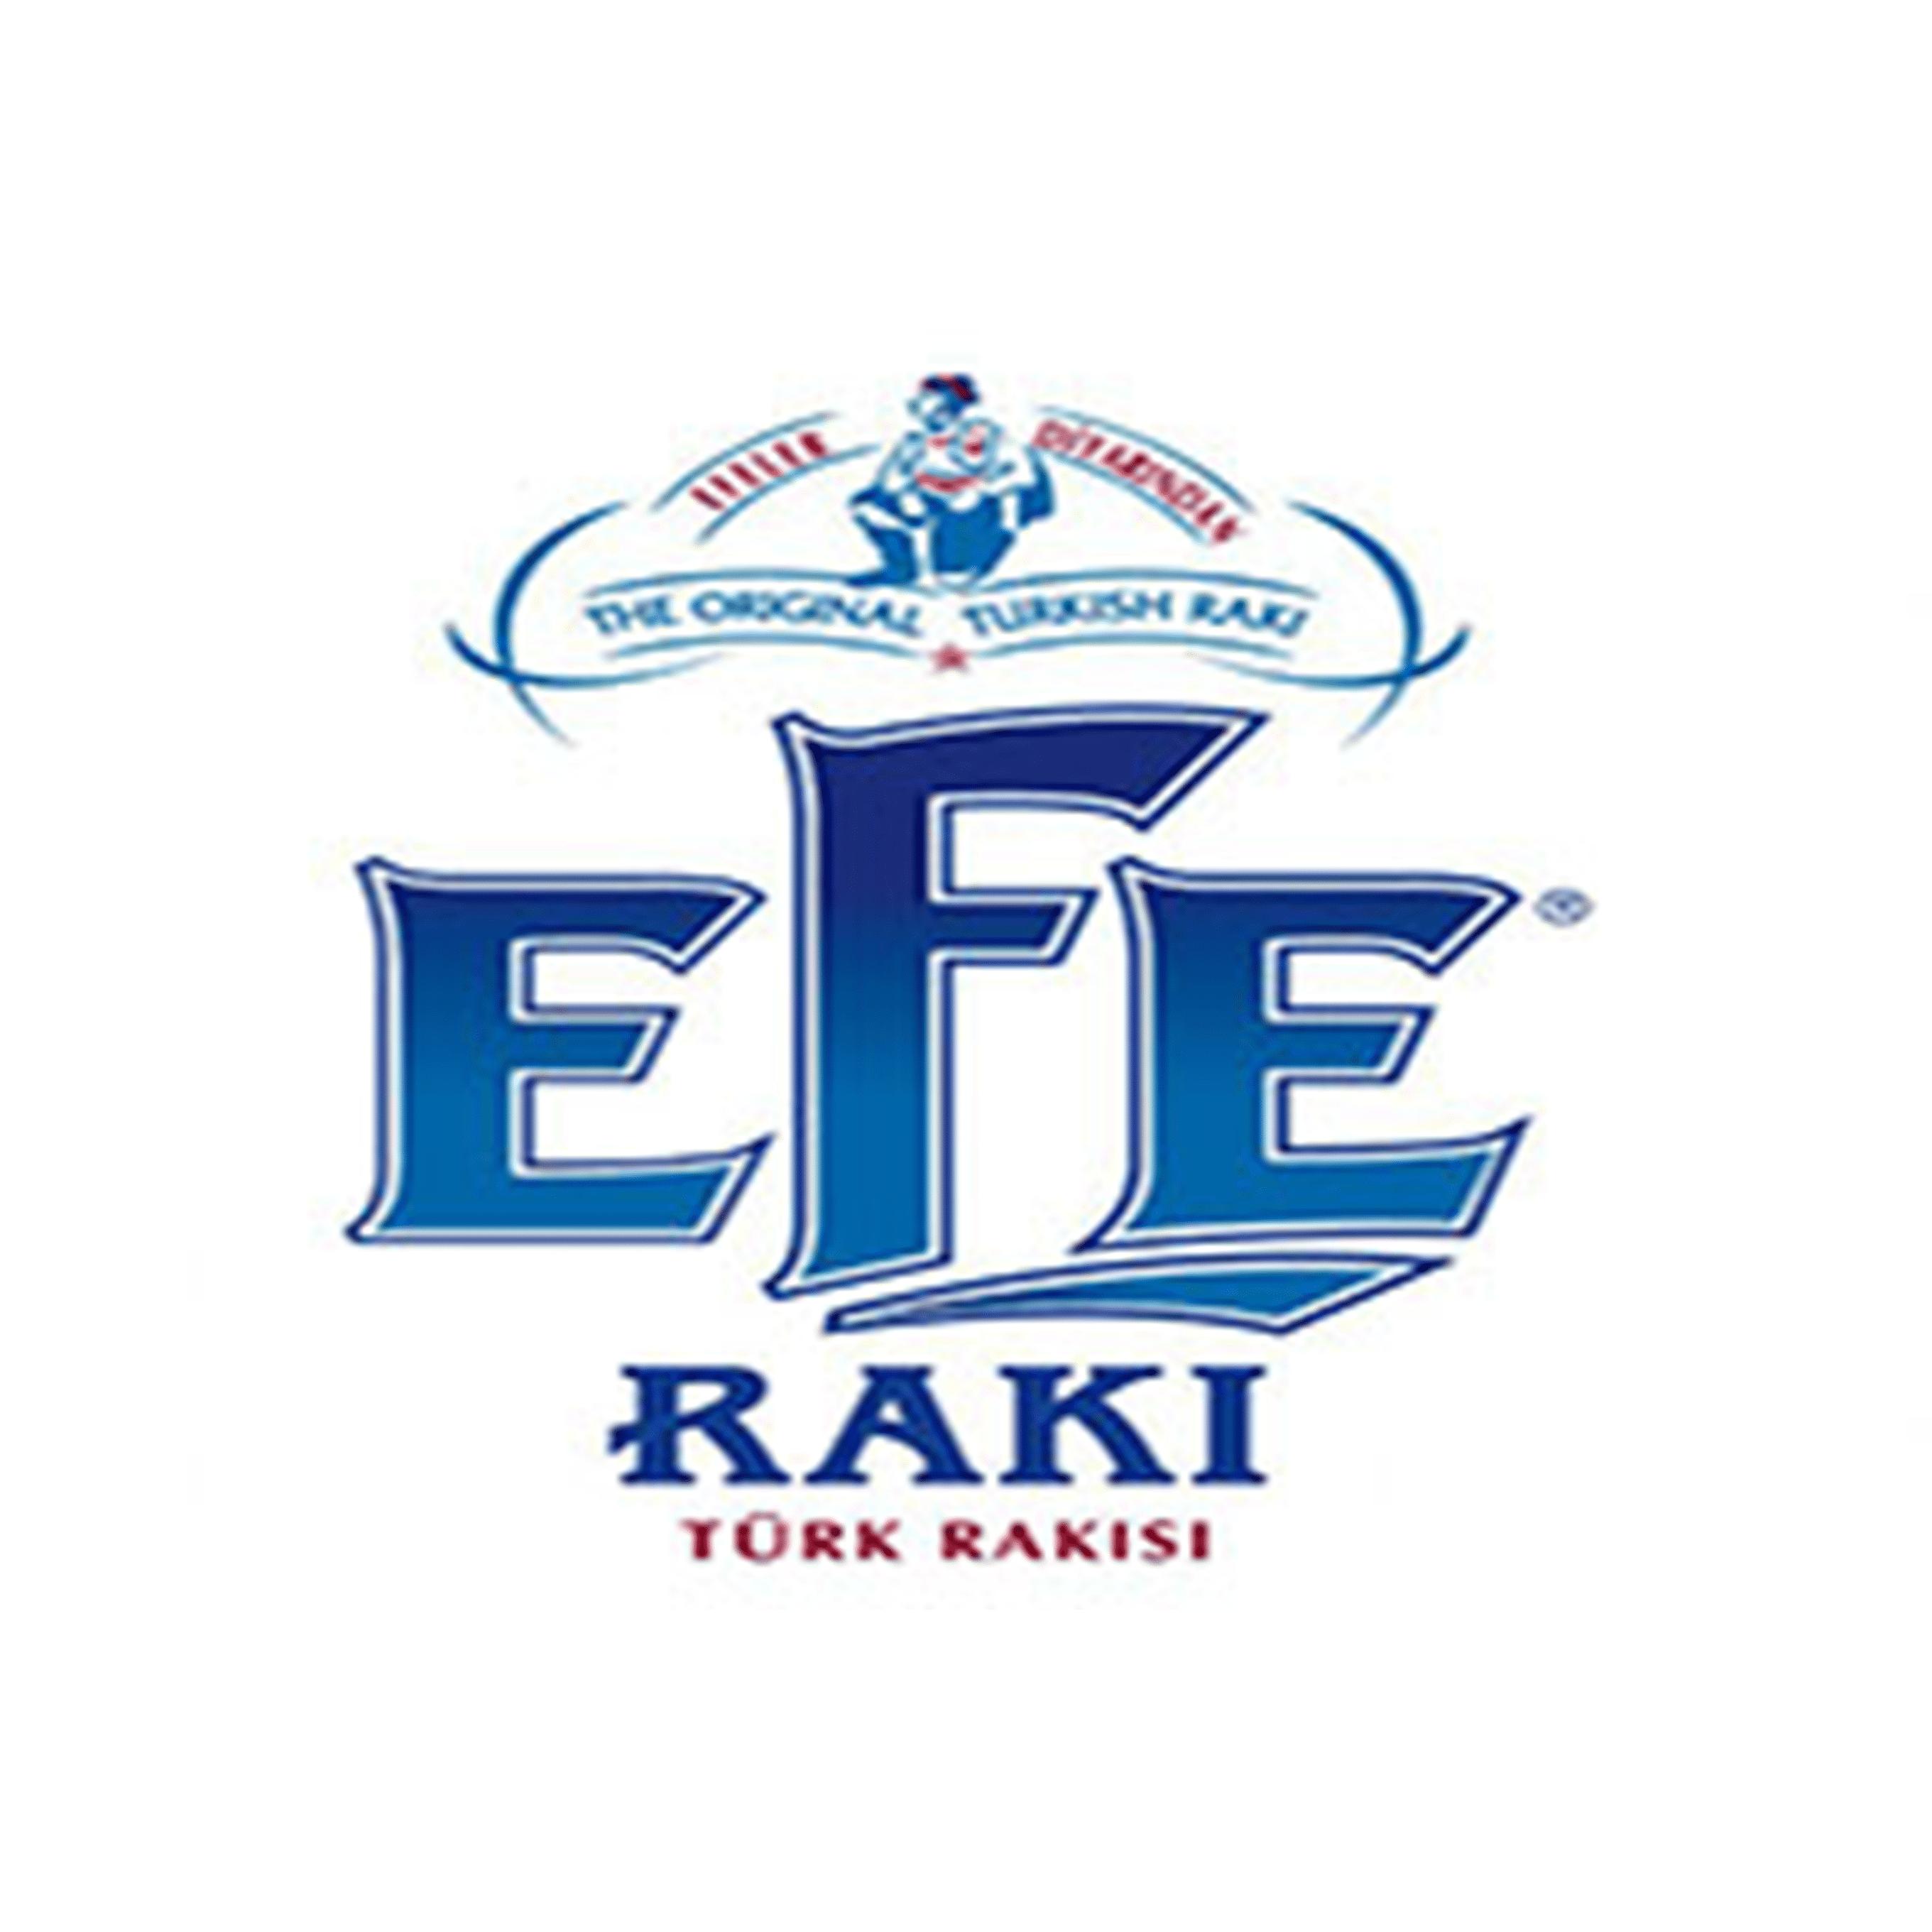 efe-fresh-raki